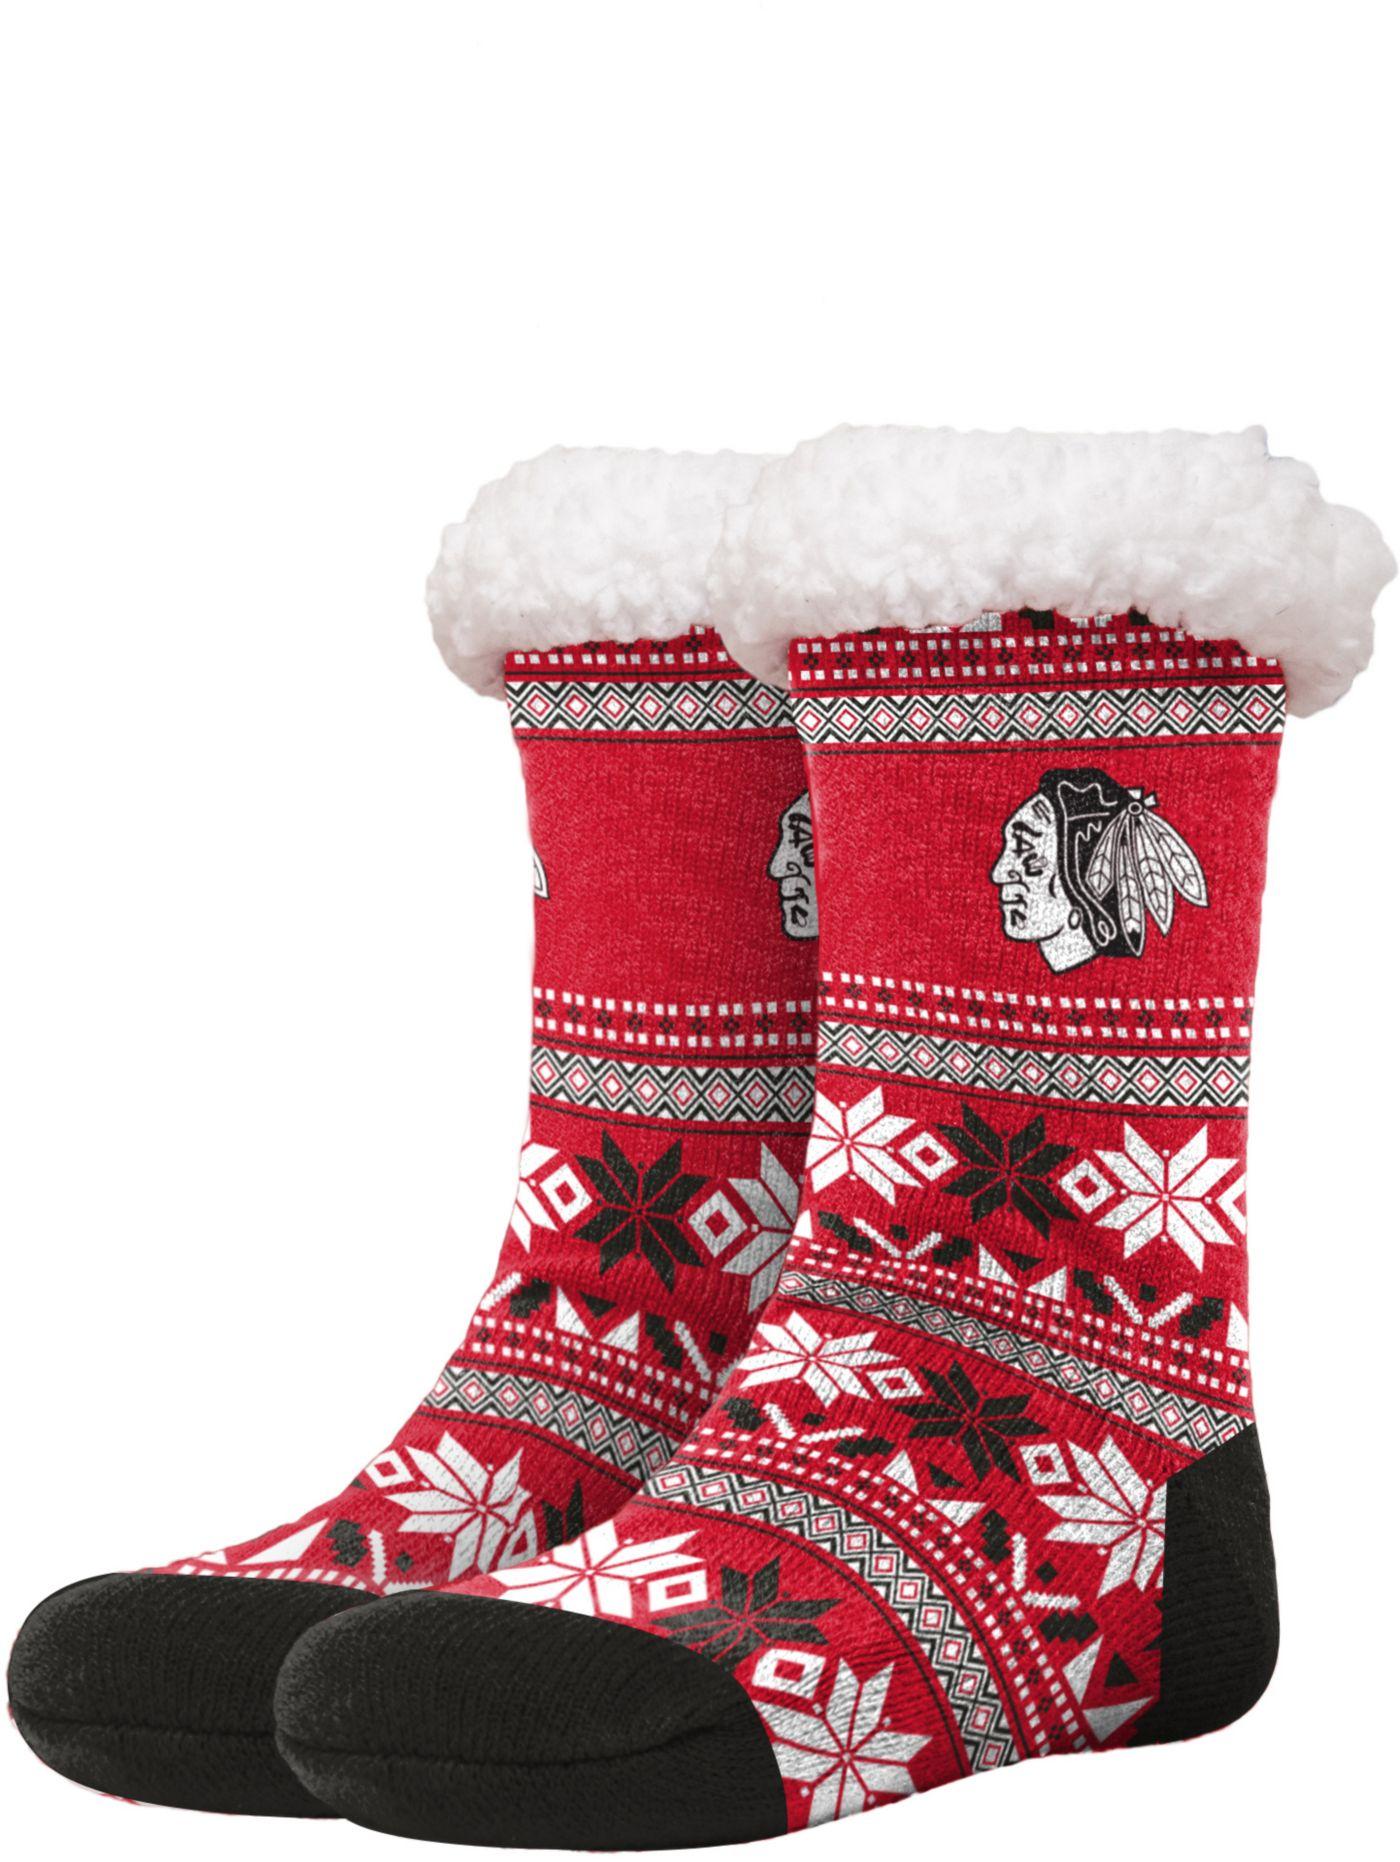 FOCO Chicago Blackhawks Footy Slippers